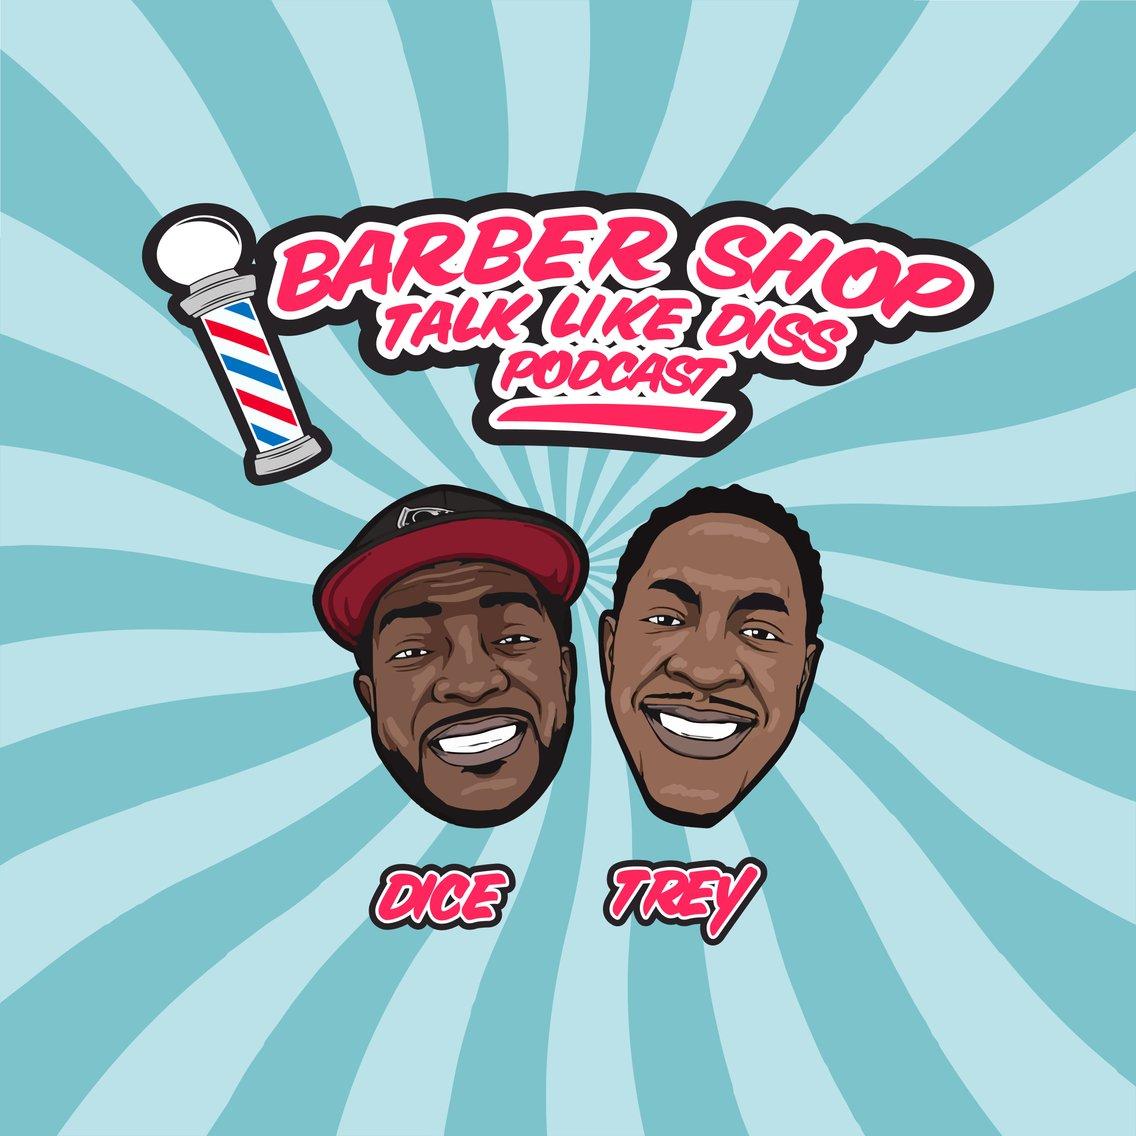 Barbershop Talk Like Diss - immagine di copertina